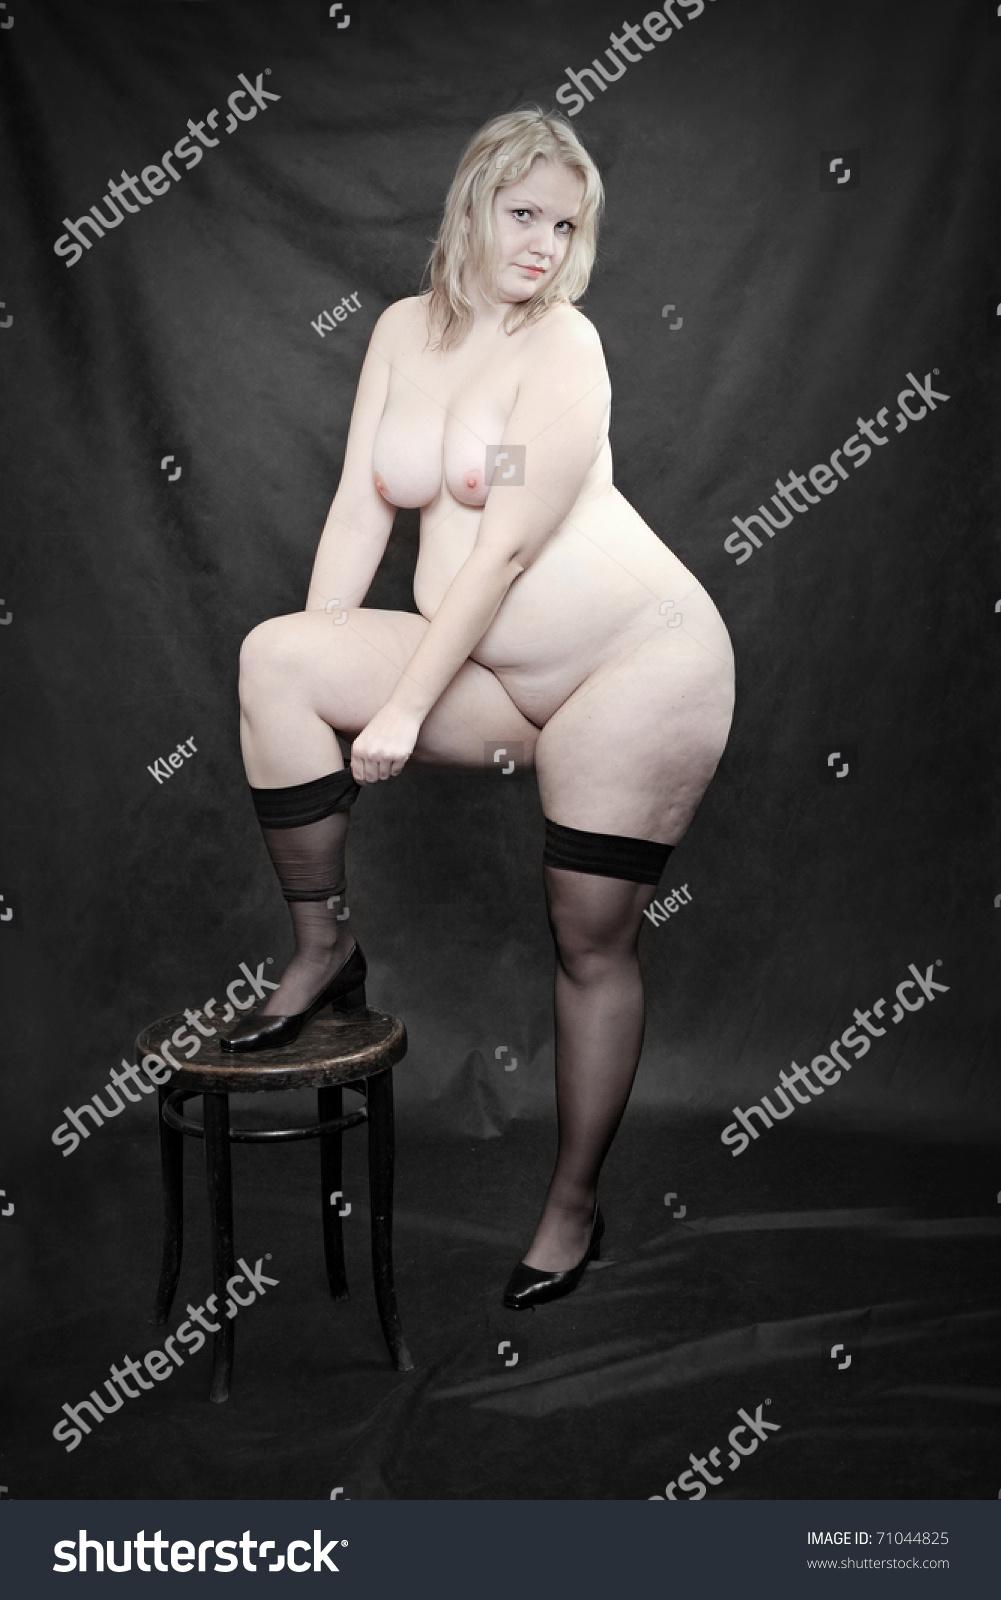 Nude pic of shari headley